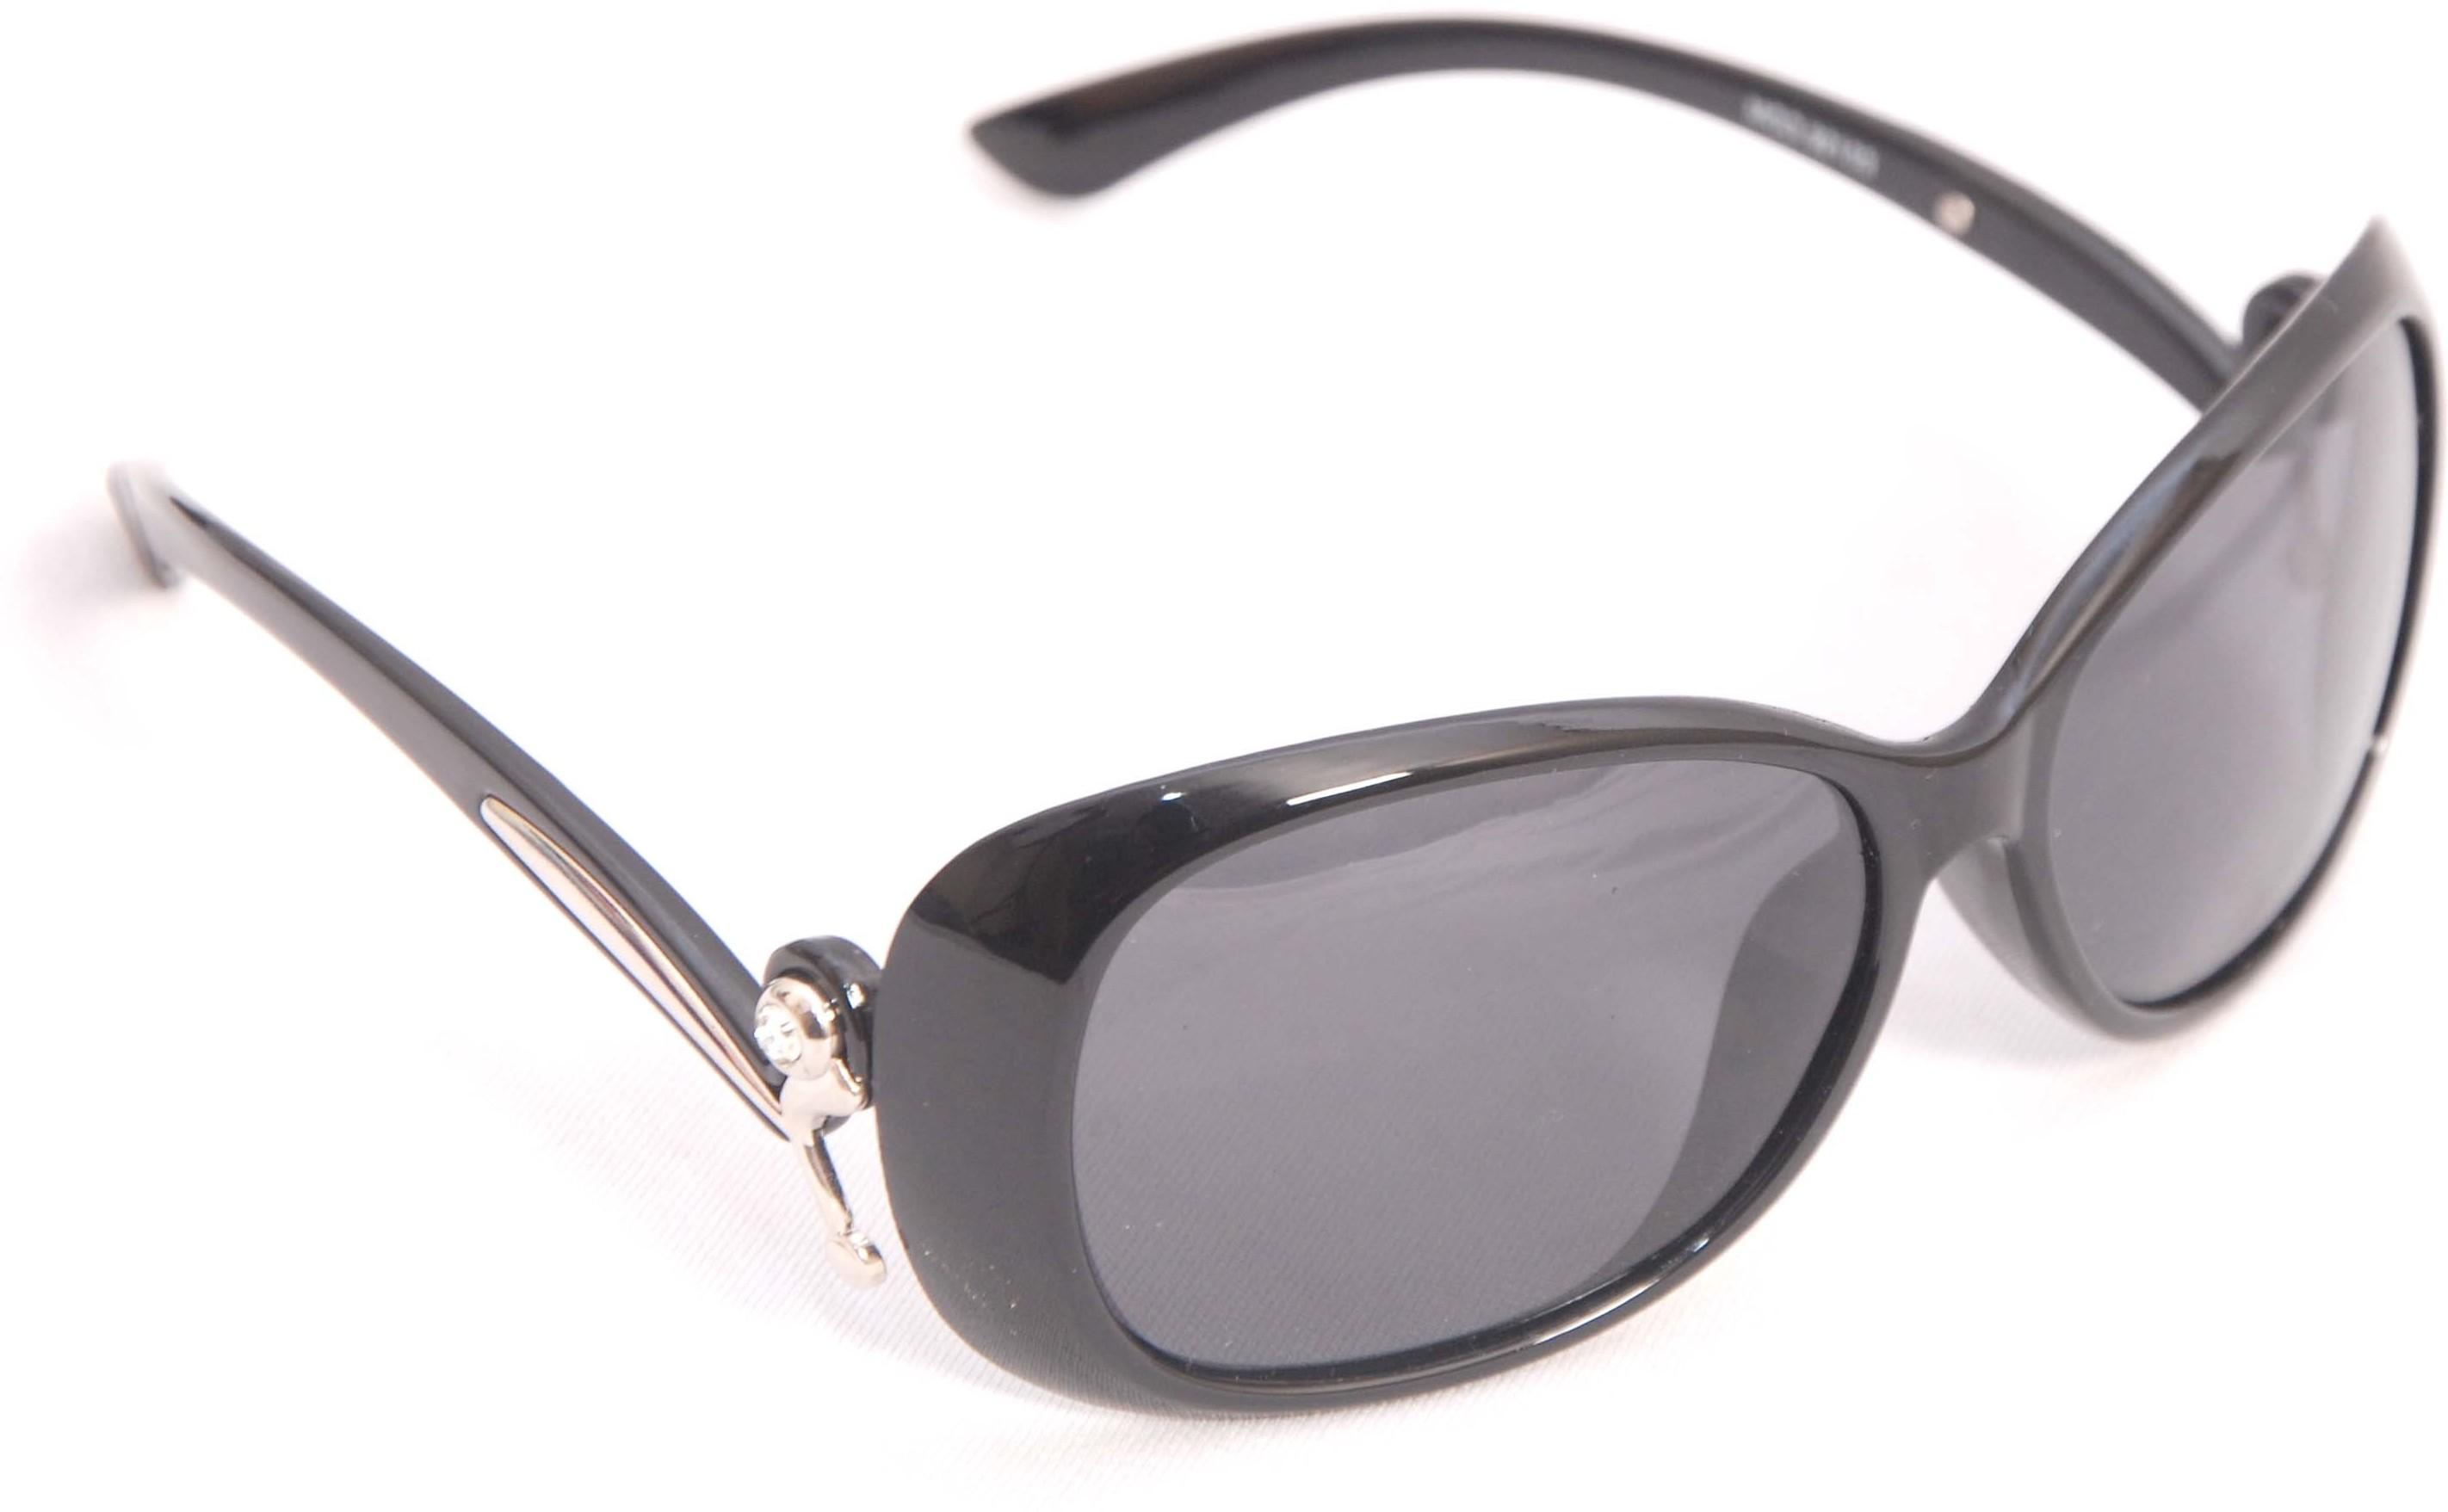 inexpensive sunglasses online  sunglasses online